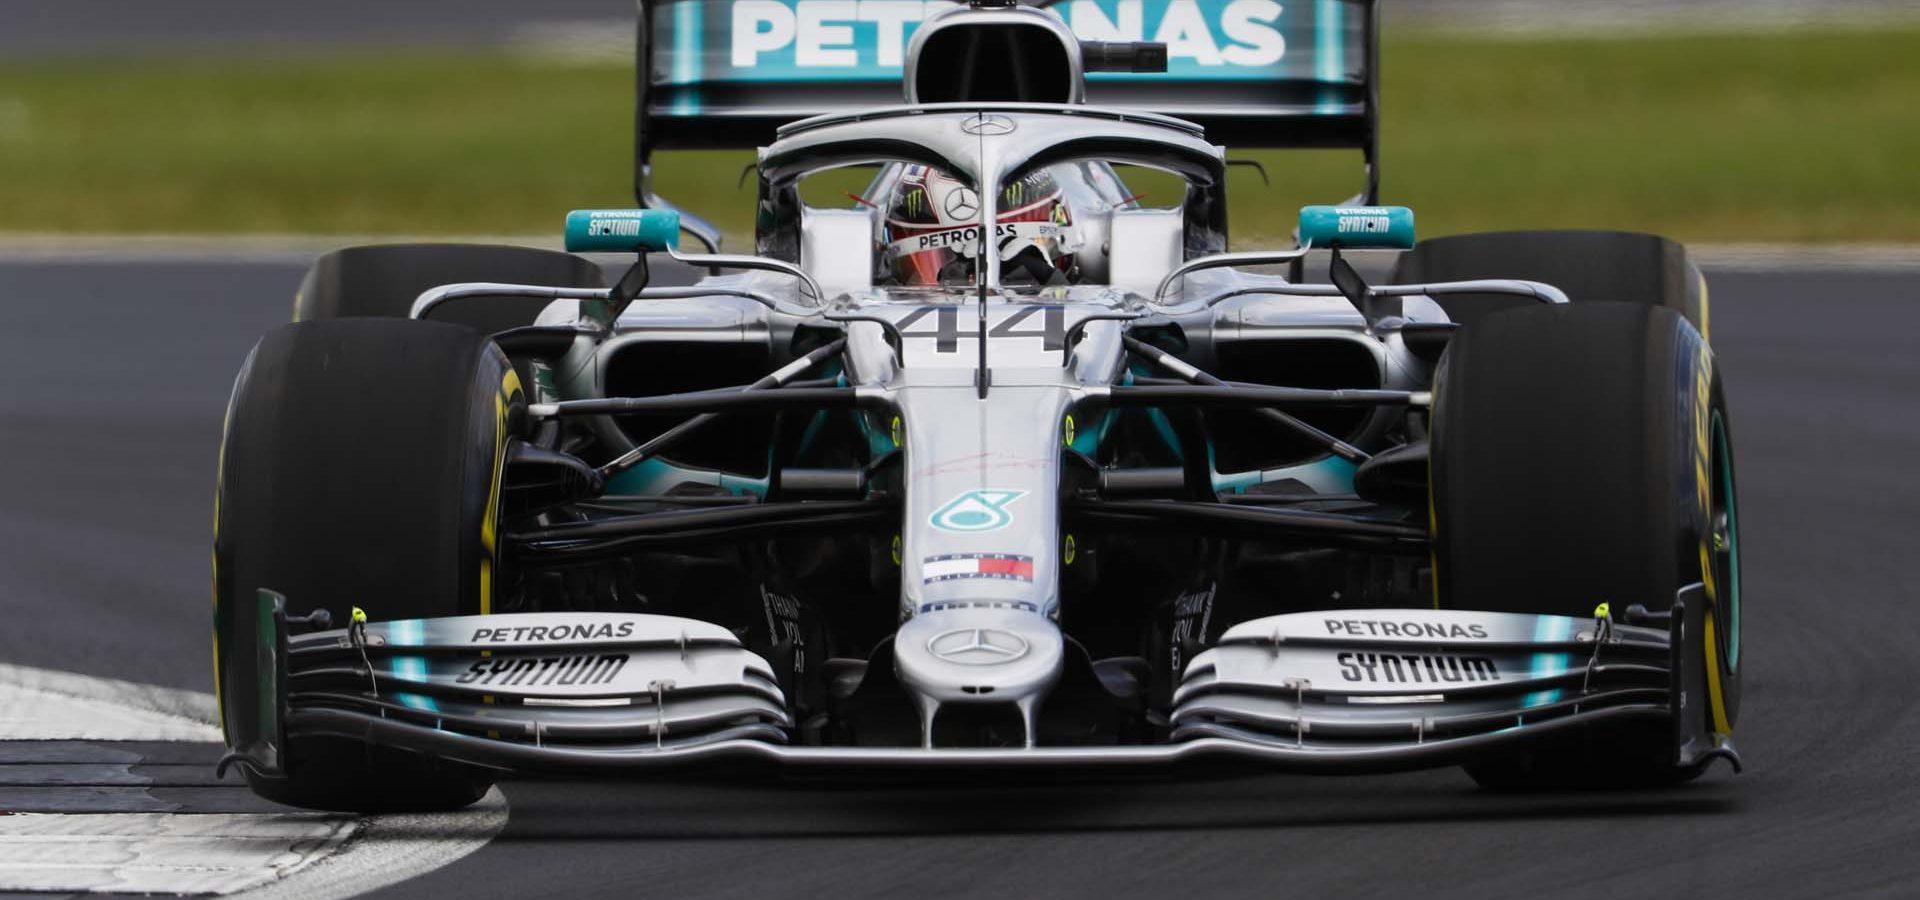 2019 British Grand Prix, Friday - LAT Images Lewis Hamilton Mercedes